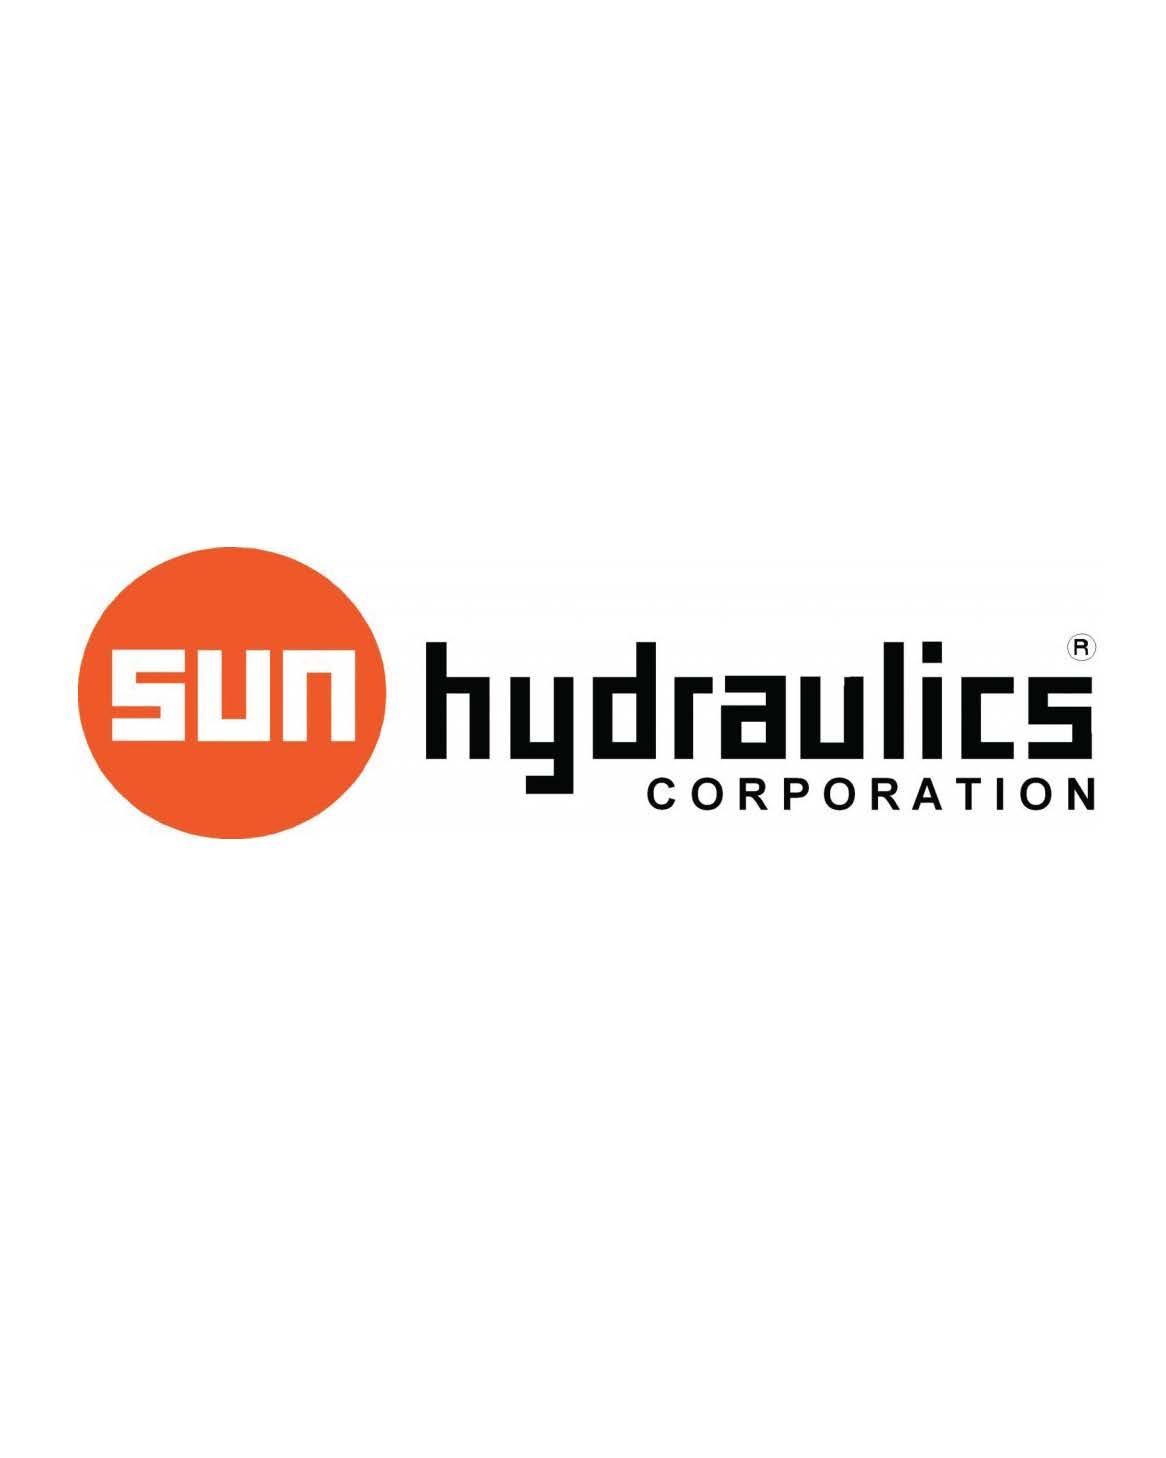 Sun Hydrolics Logo.jpg